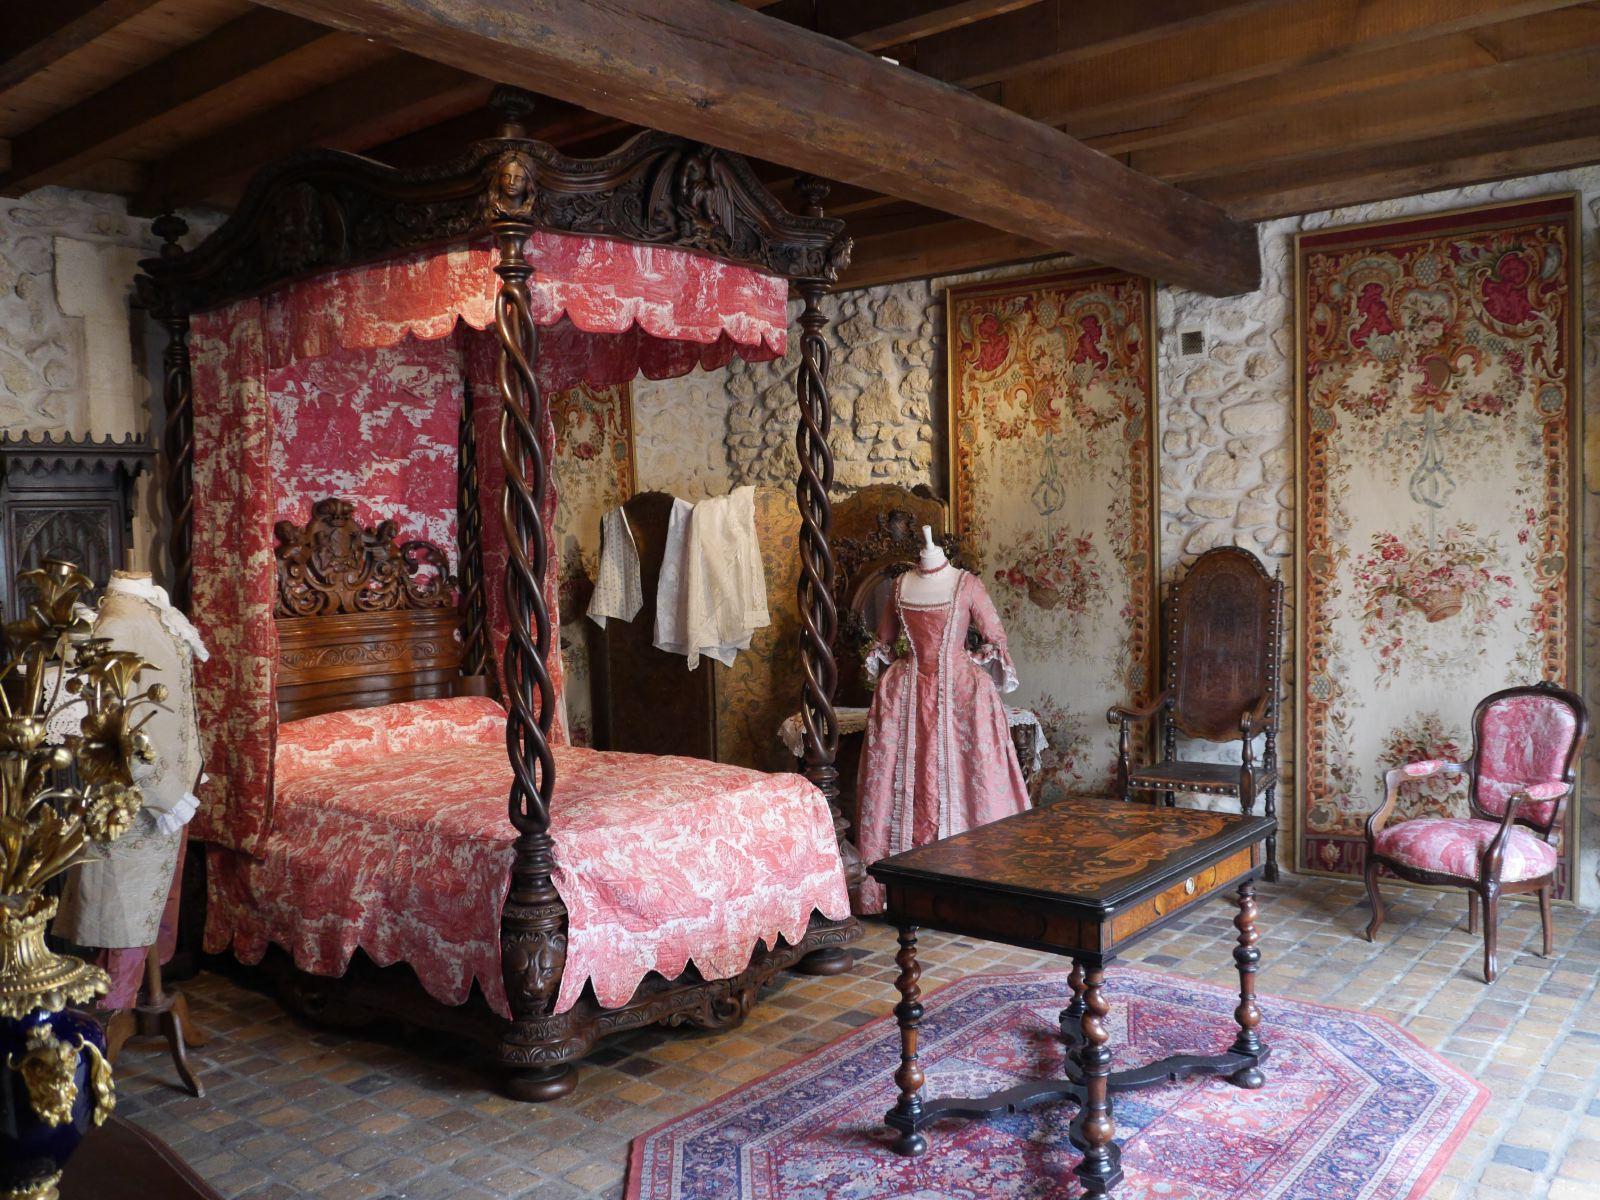 Beautiran-Musée des Techniques-la chambre-©.JPG